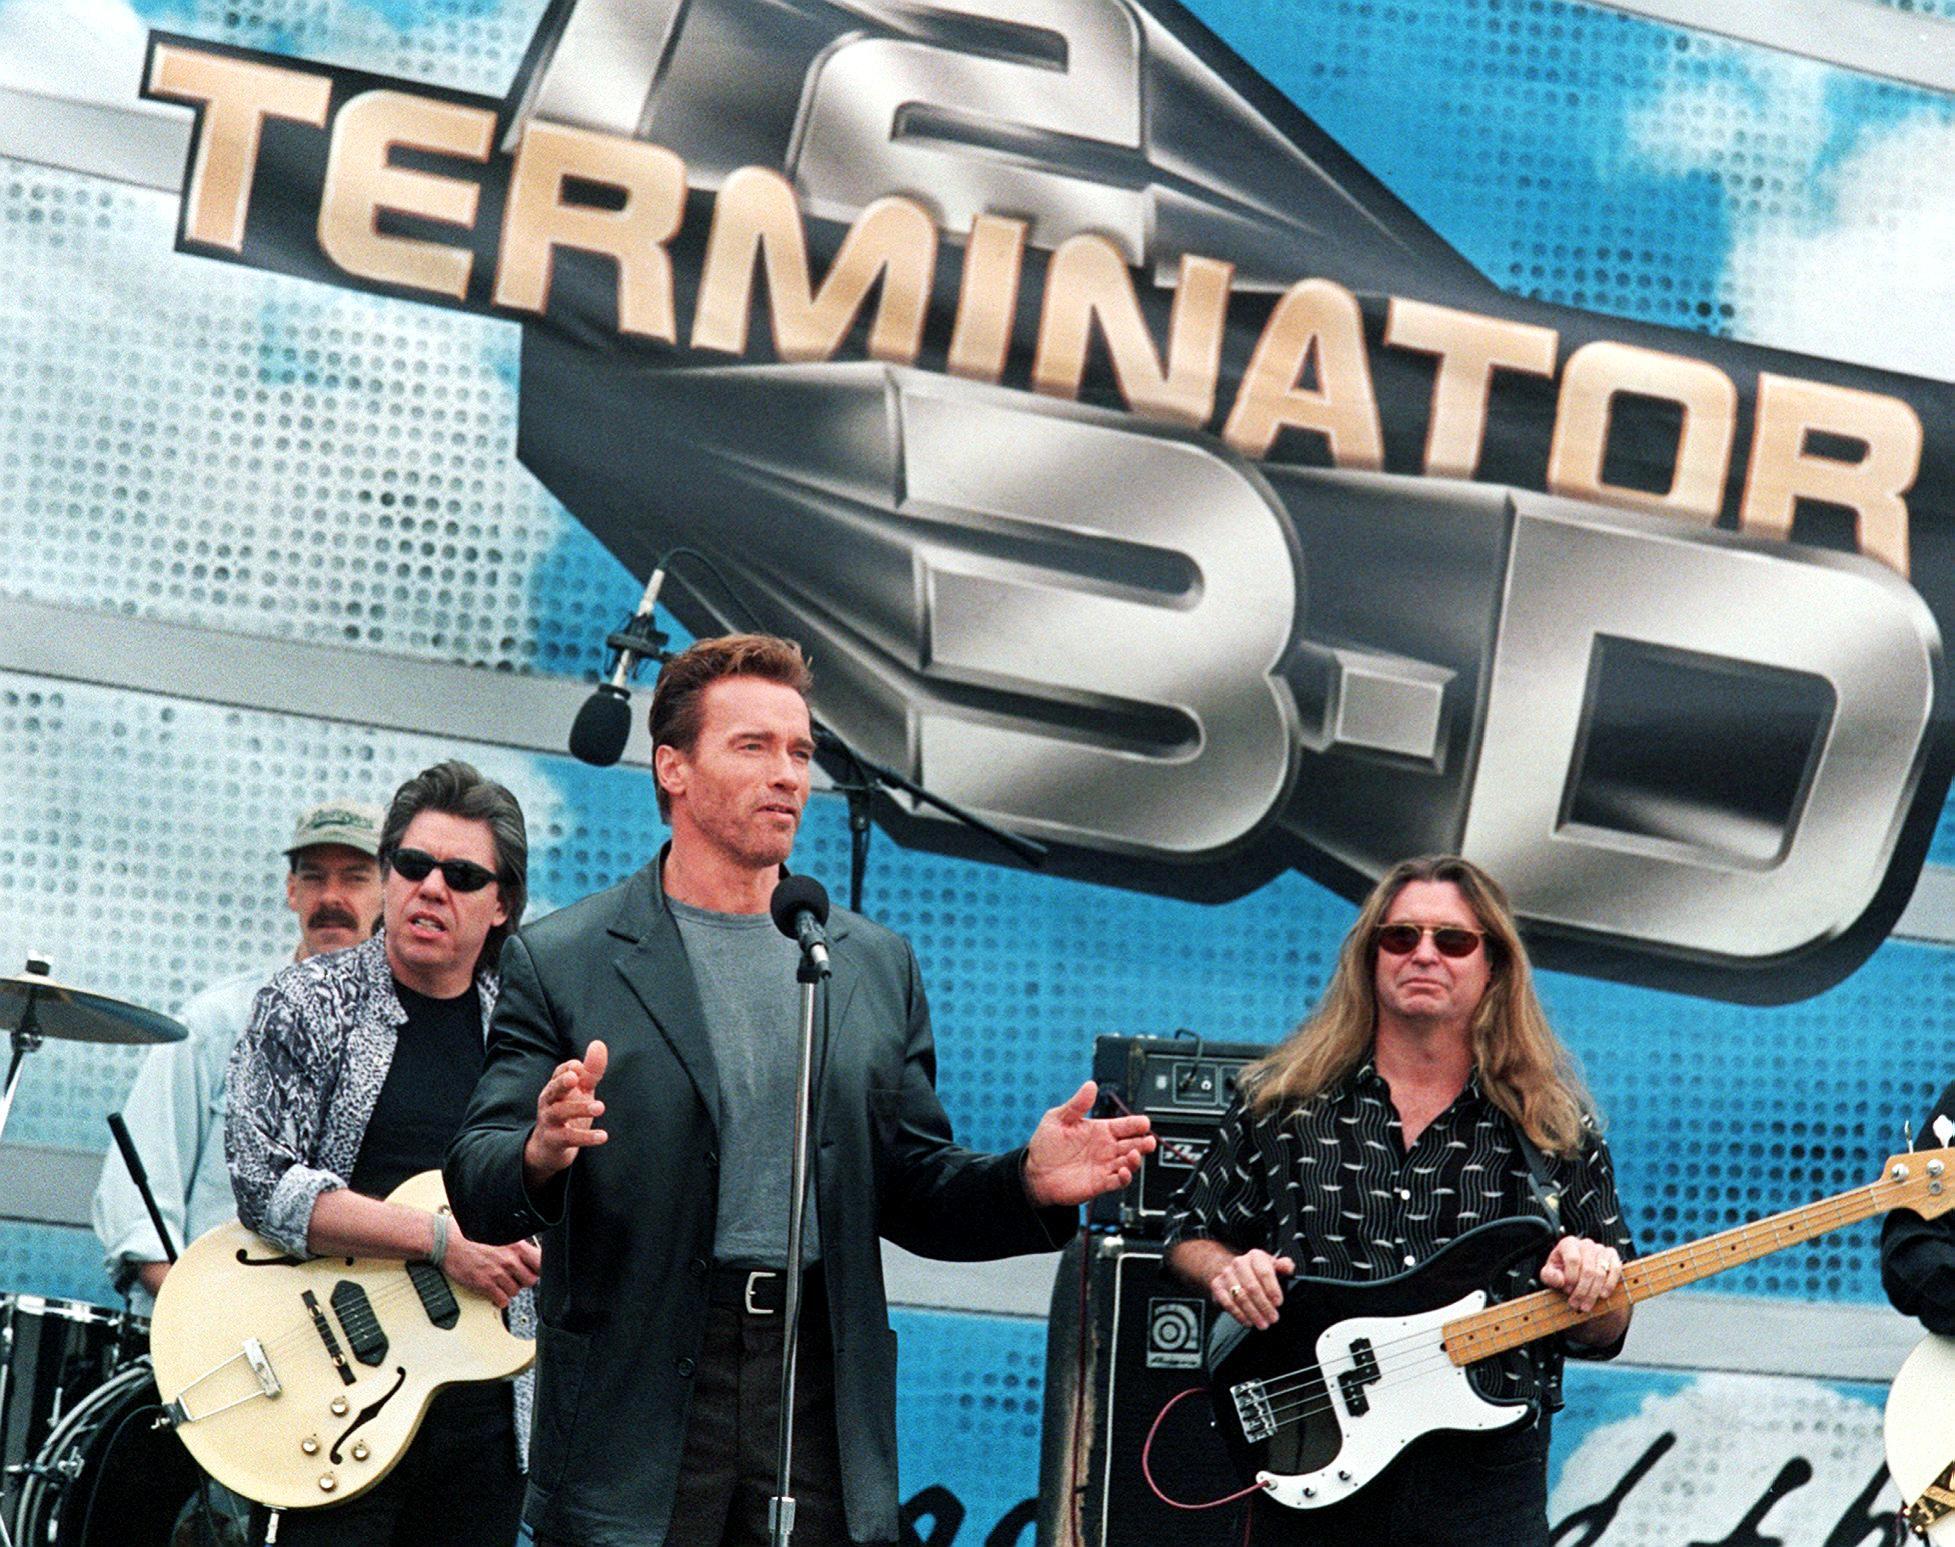 US actor Arnold Schwarzenegger (front L) introduce